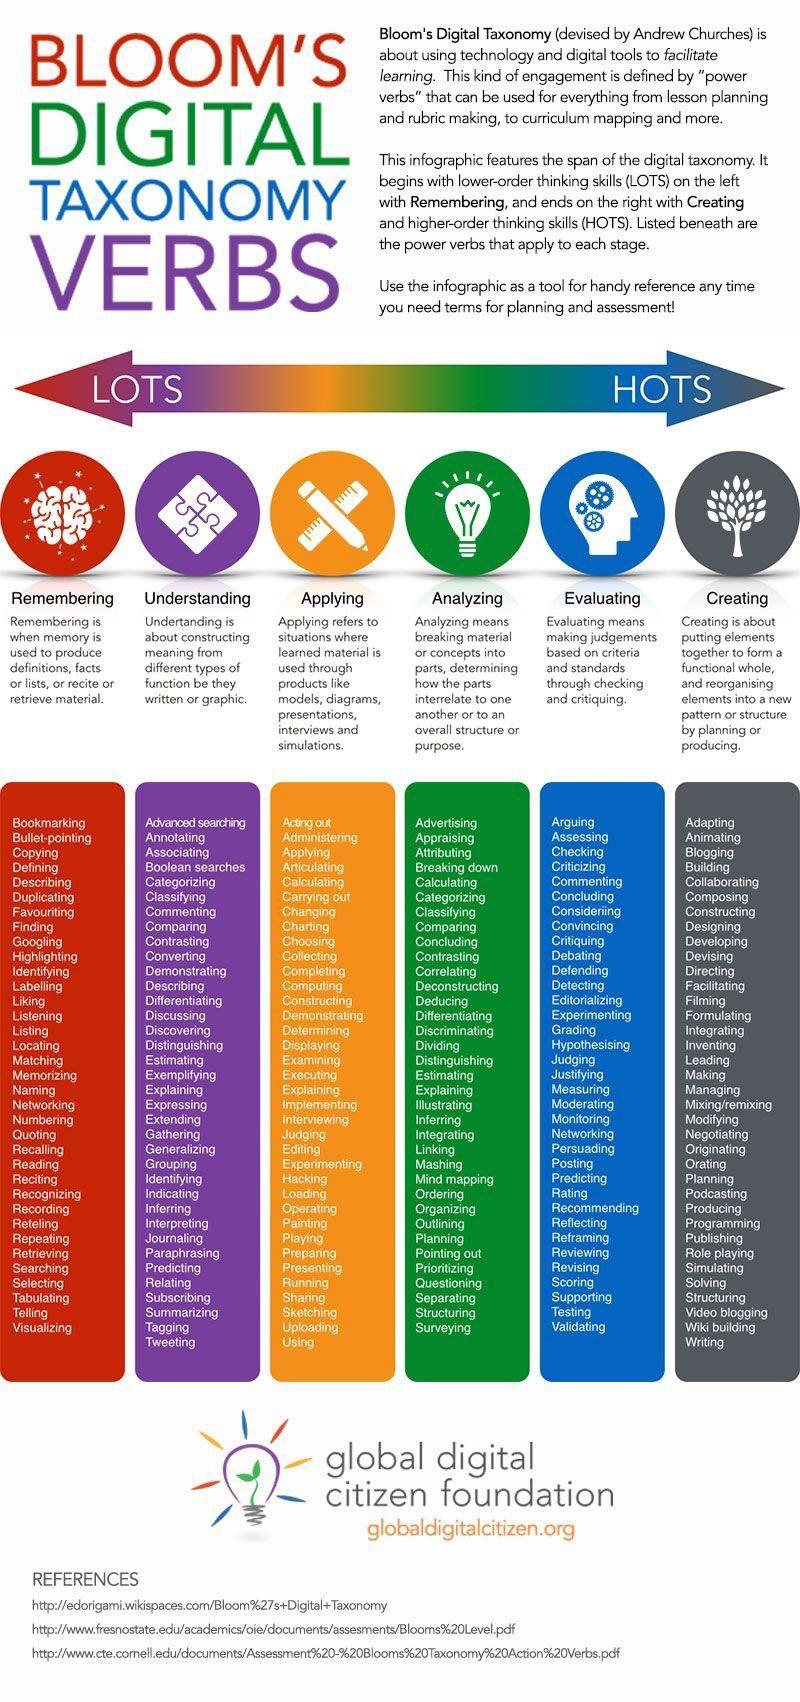 Bloom S Action Verb Kepemimpinan Pendidikan Psikologi Do You Need To Paraphrase Wikipedia